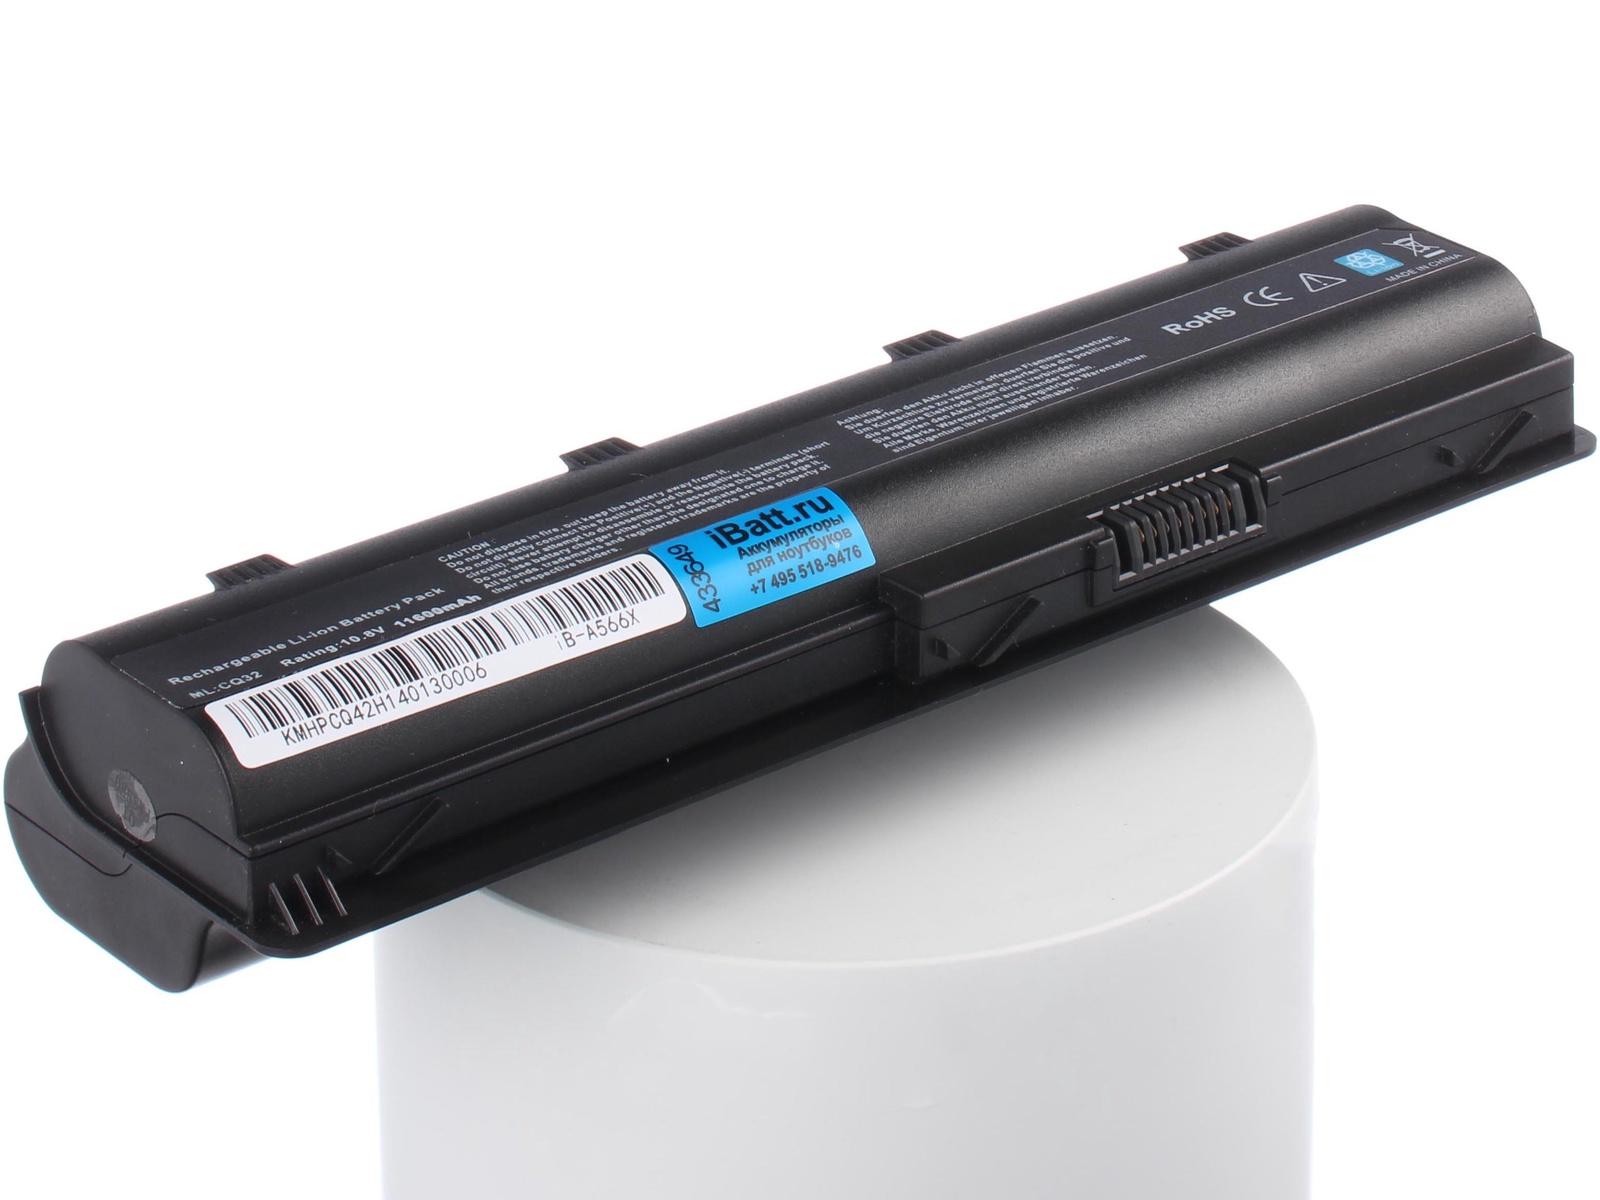 Аккумулятор для ноутбука iBatt для HP-Compaq G62-b53SR, G62-b71SR, G62-b73SR, G62-b74SR, Pavilion dm4-1265dx, Pavilion dm4t-1000, Pavilion dv3-4000, Pavilion dv6-3025er, Pavilion dv6-3082sr, Pavilion dv6-3120us iBatt